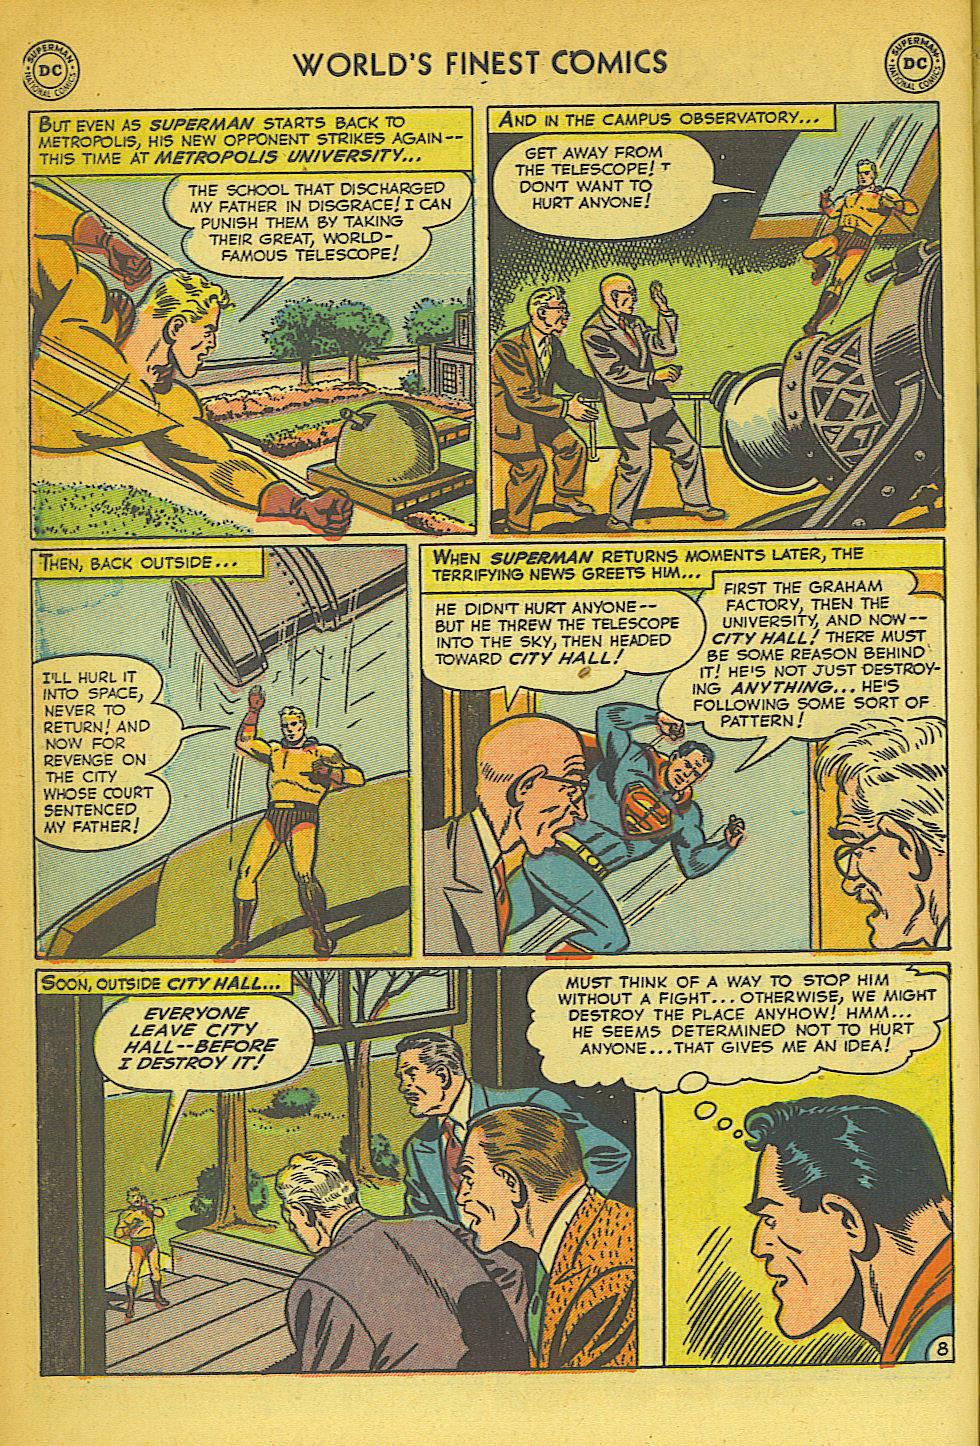 Read online World's Finest Comics comic -  Issue #57 - 10